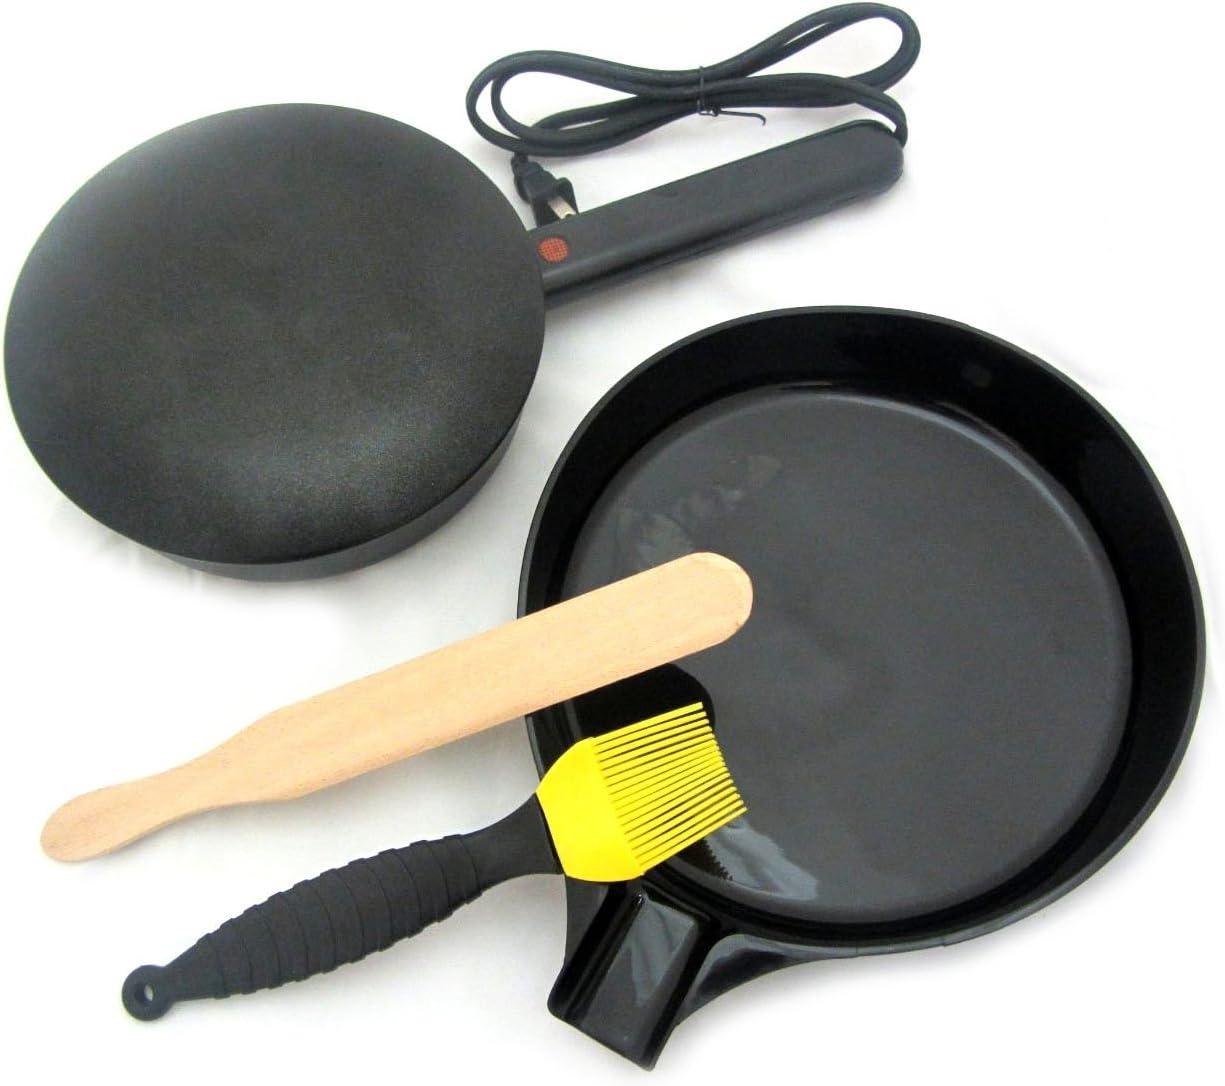 Electric Crepe Maker with BONUS Silicone Basting Brush